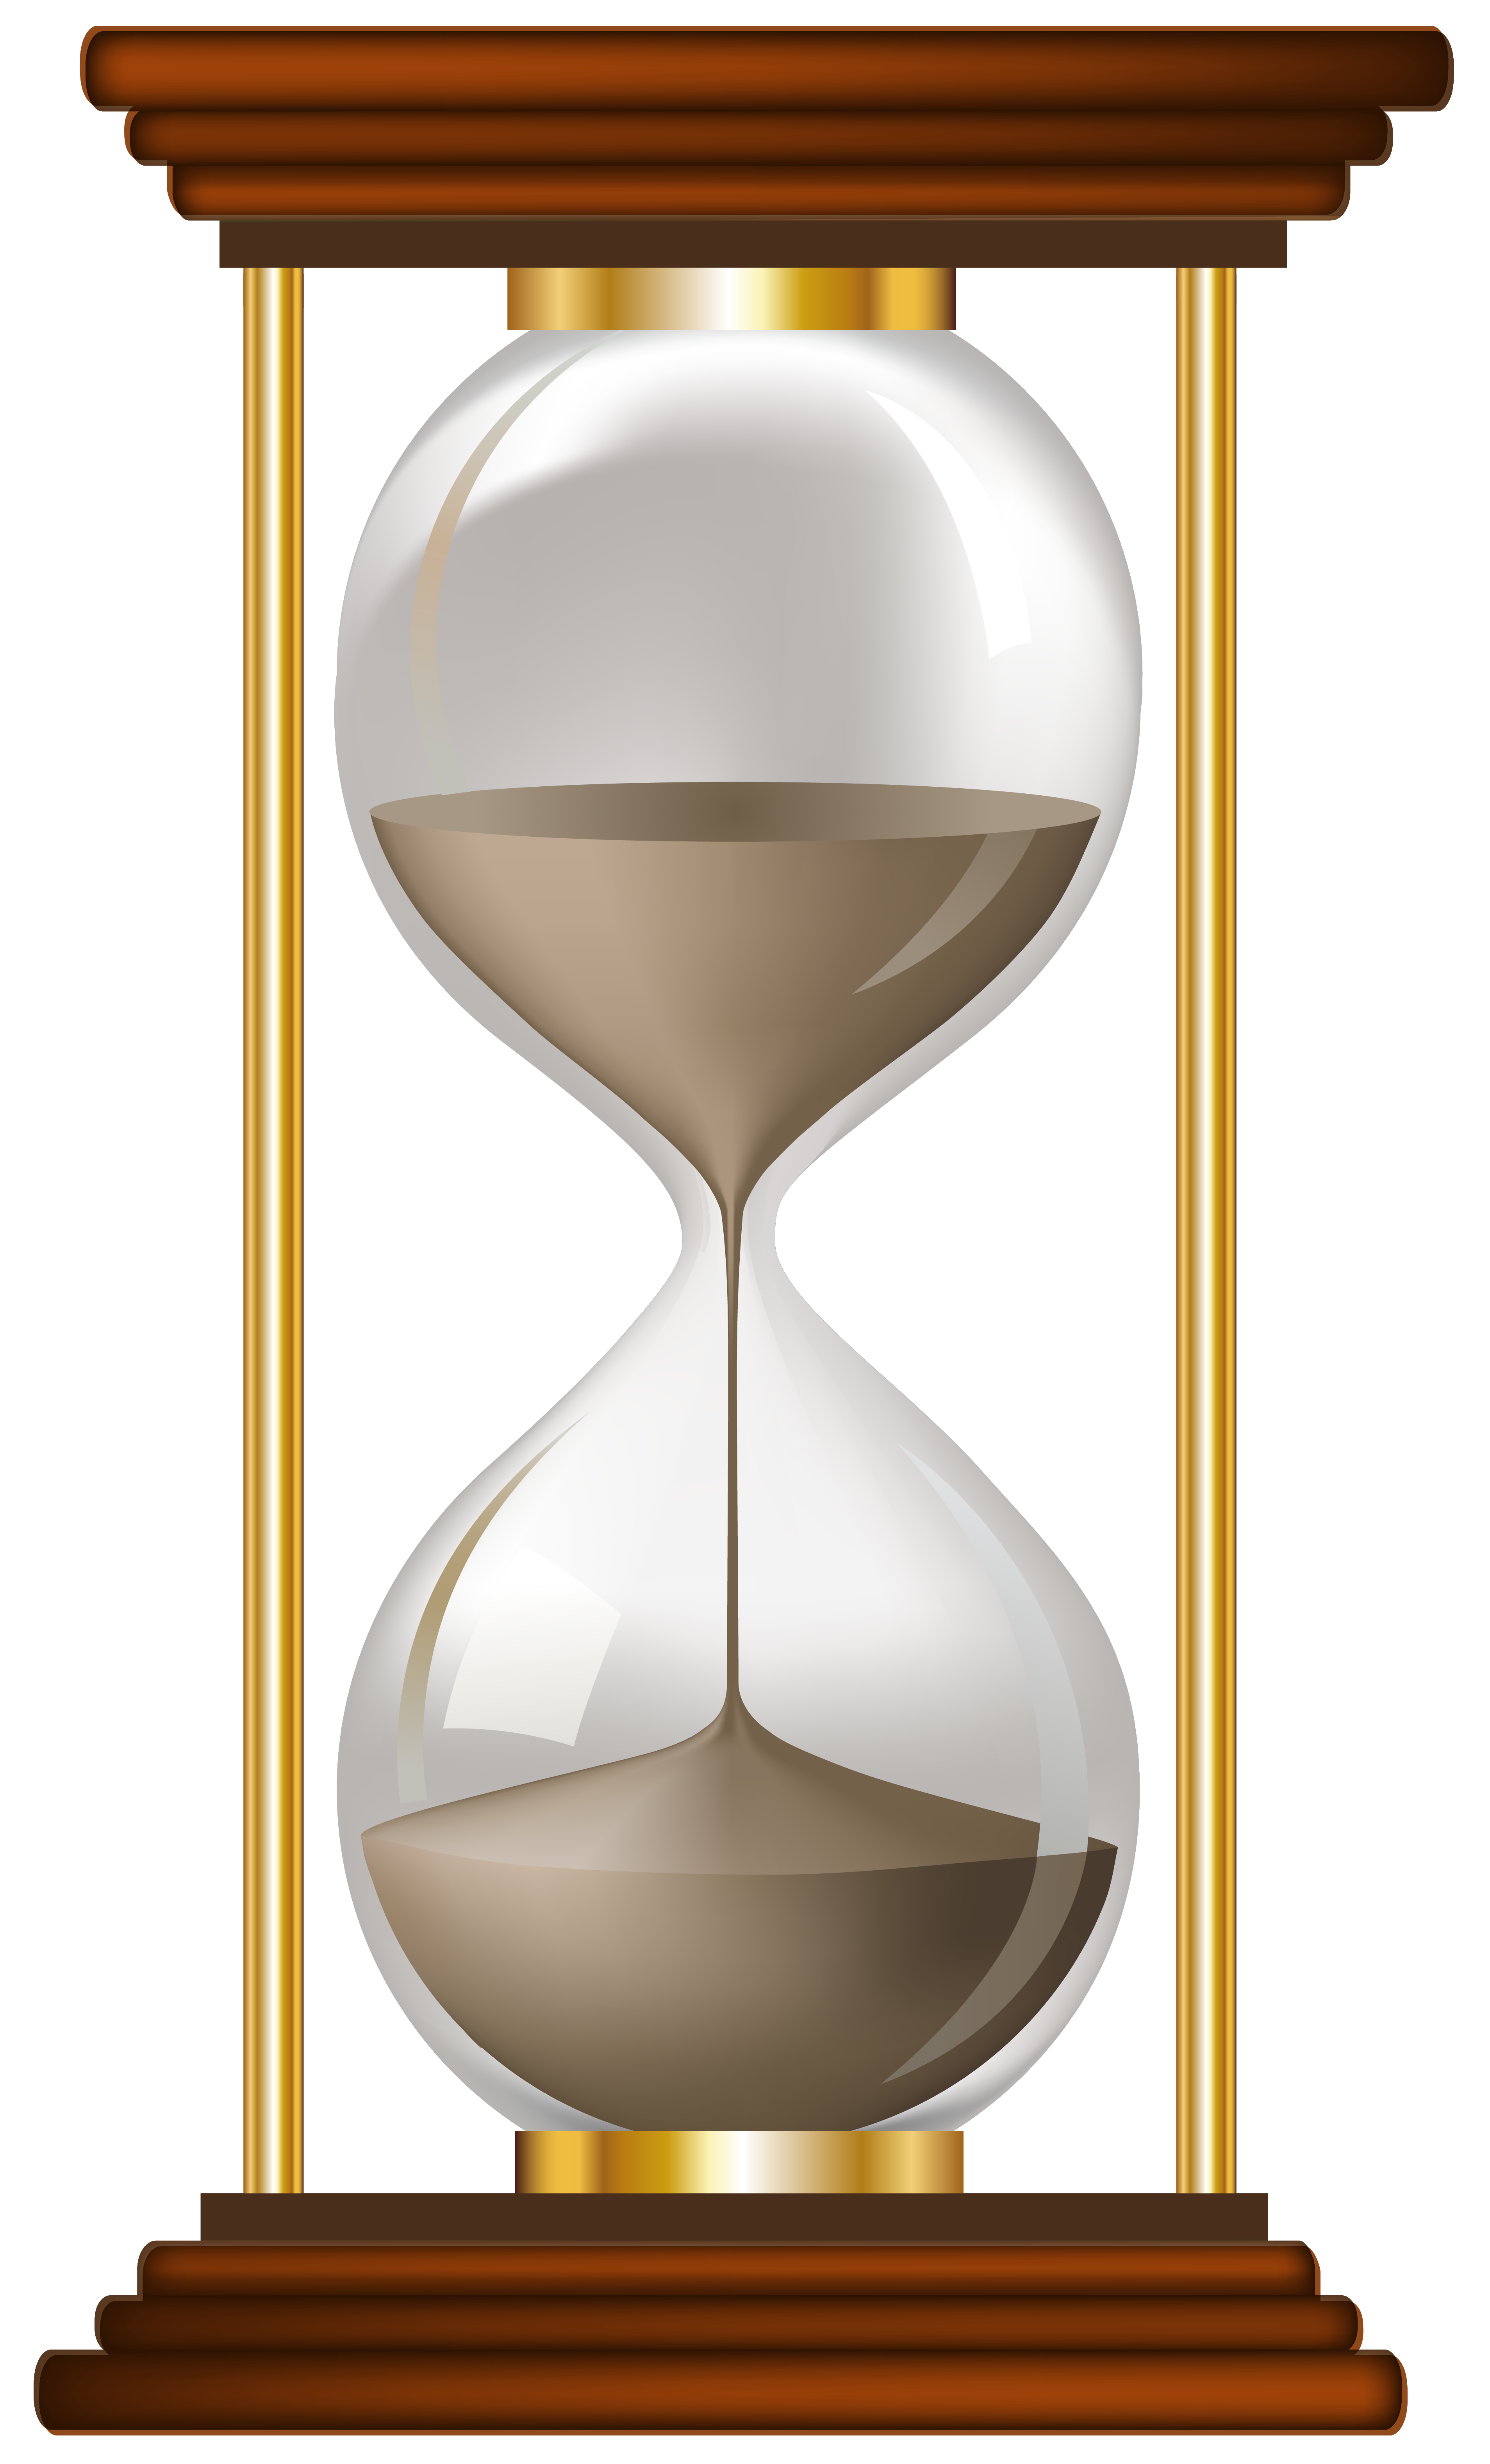 hourglass clipart fancy